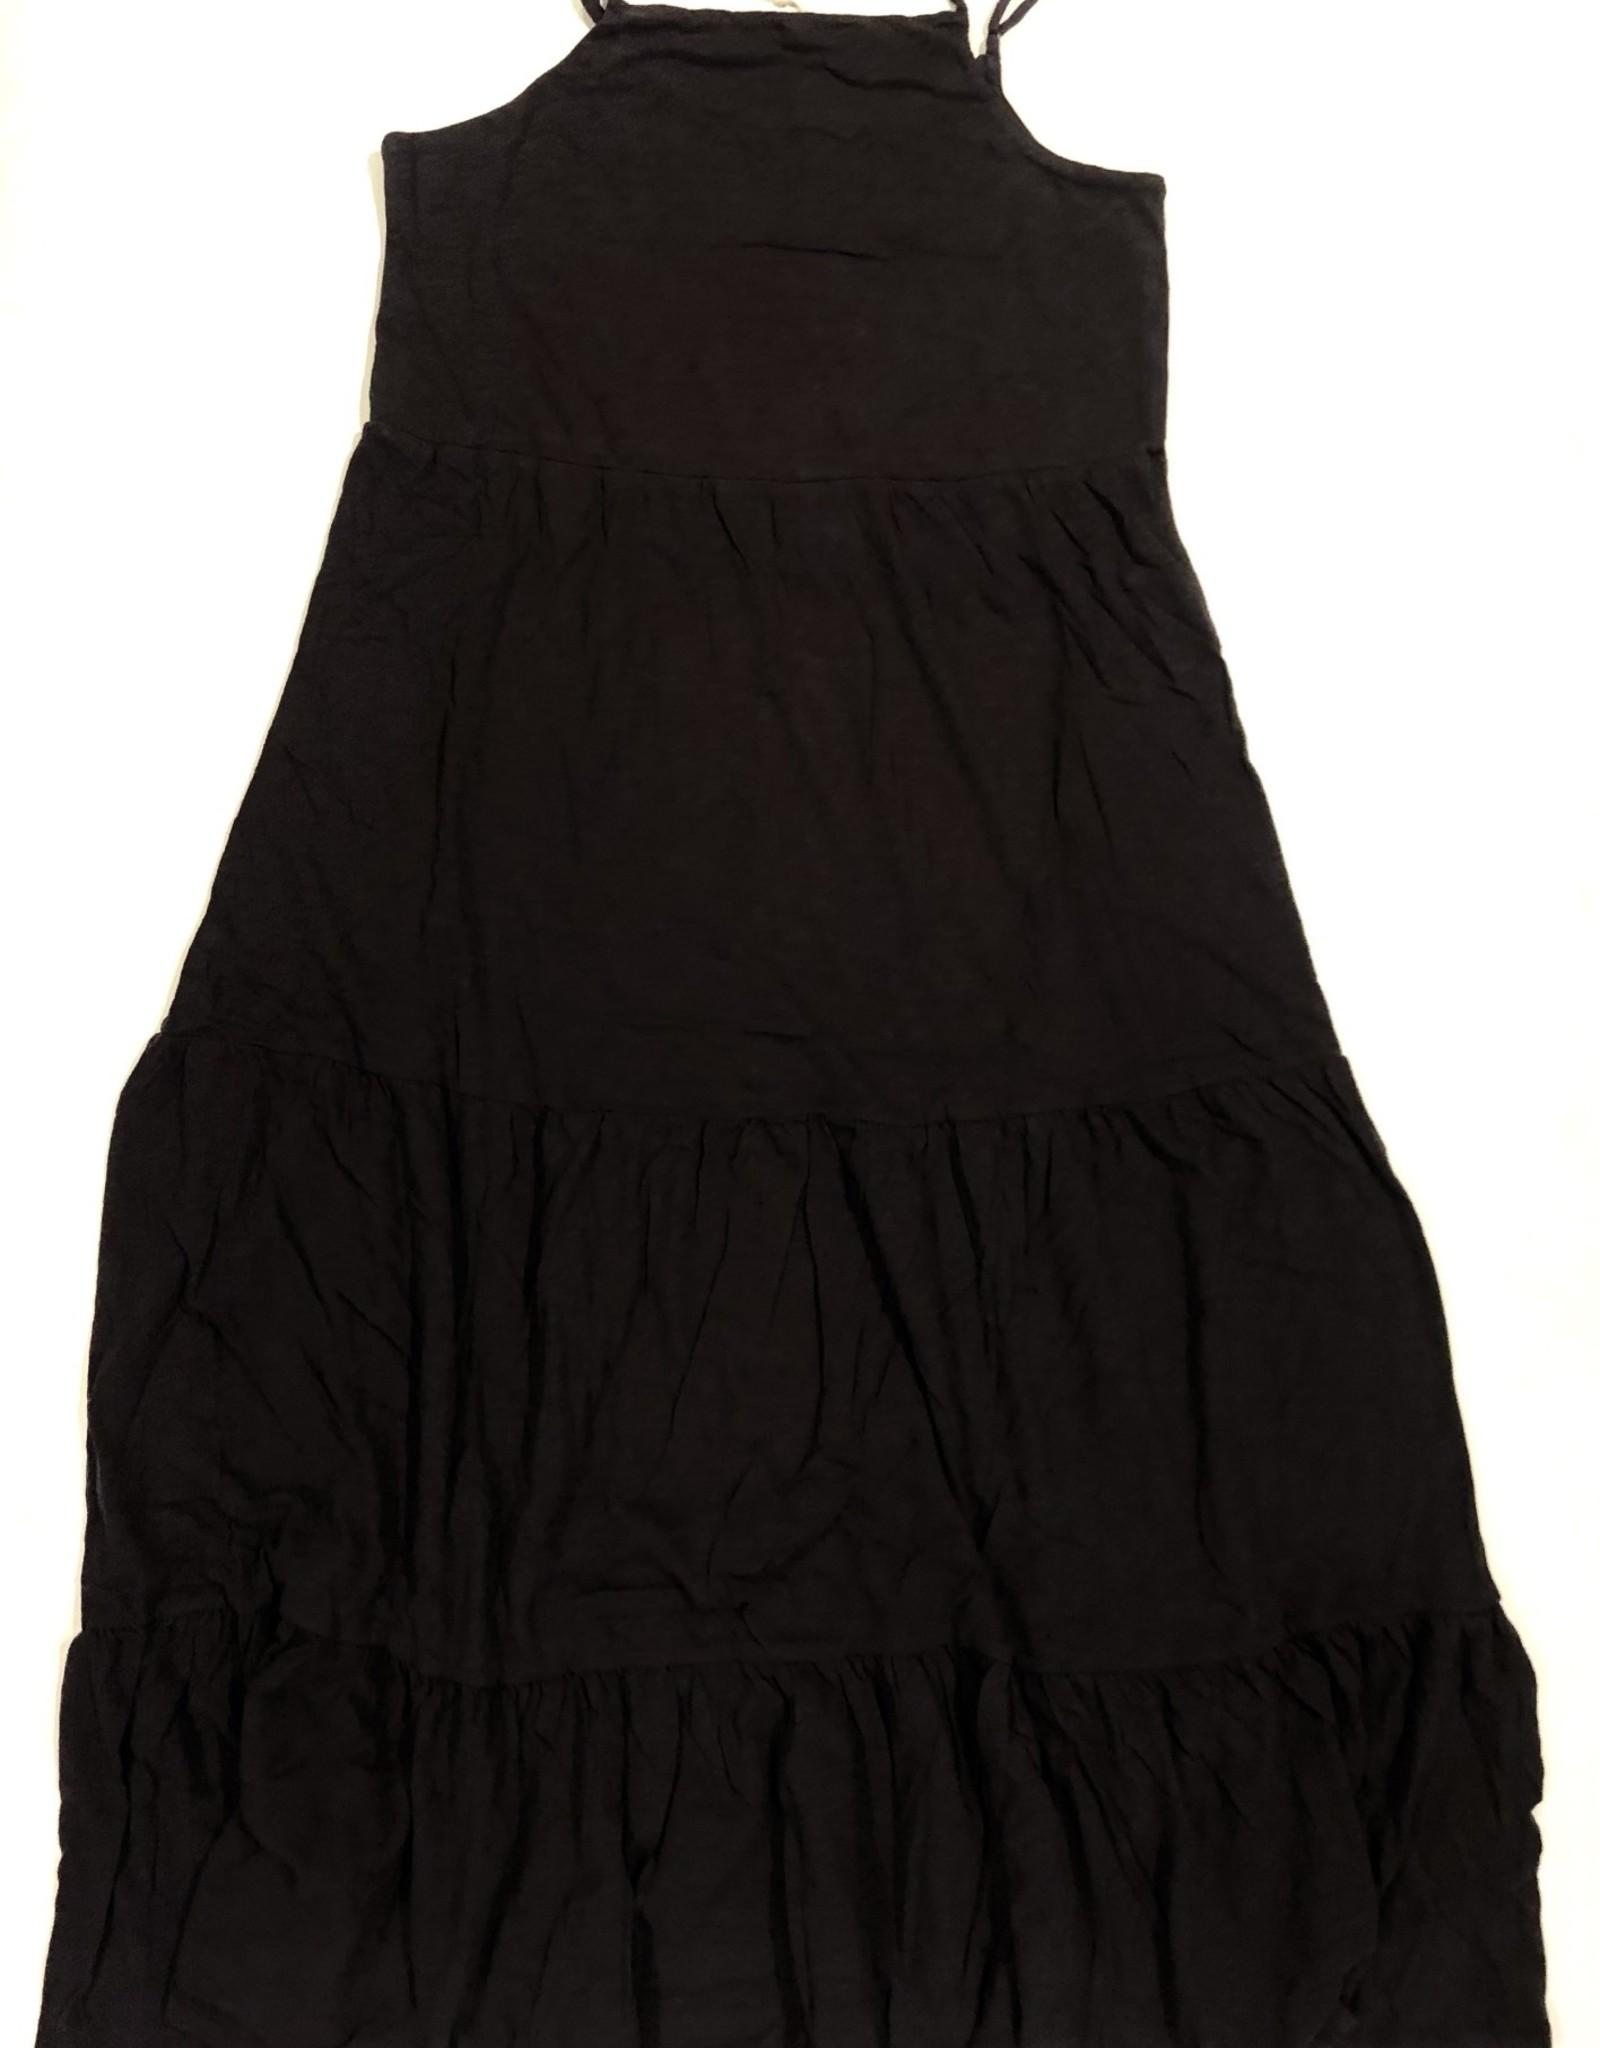 zs Rory tier slub dress zd212523